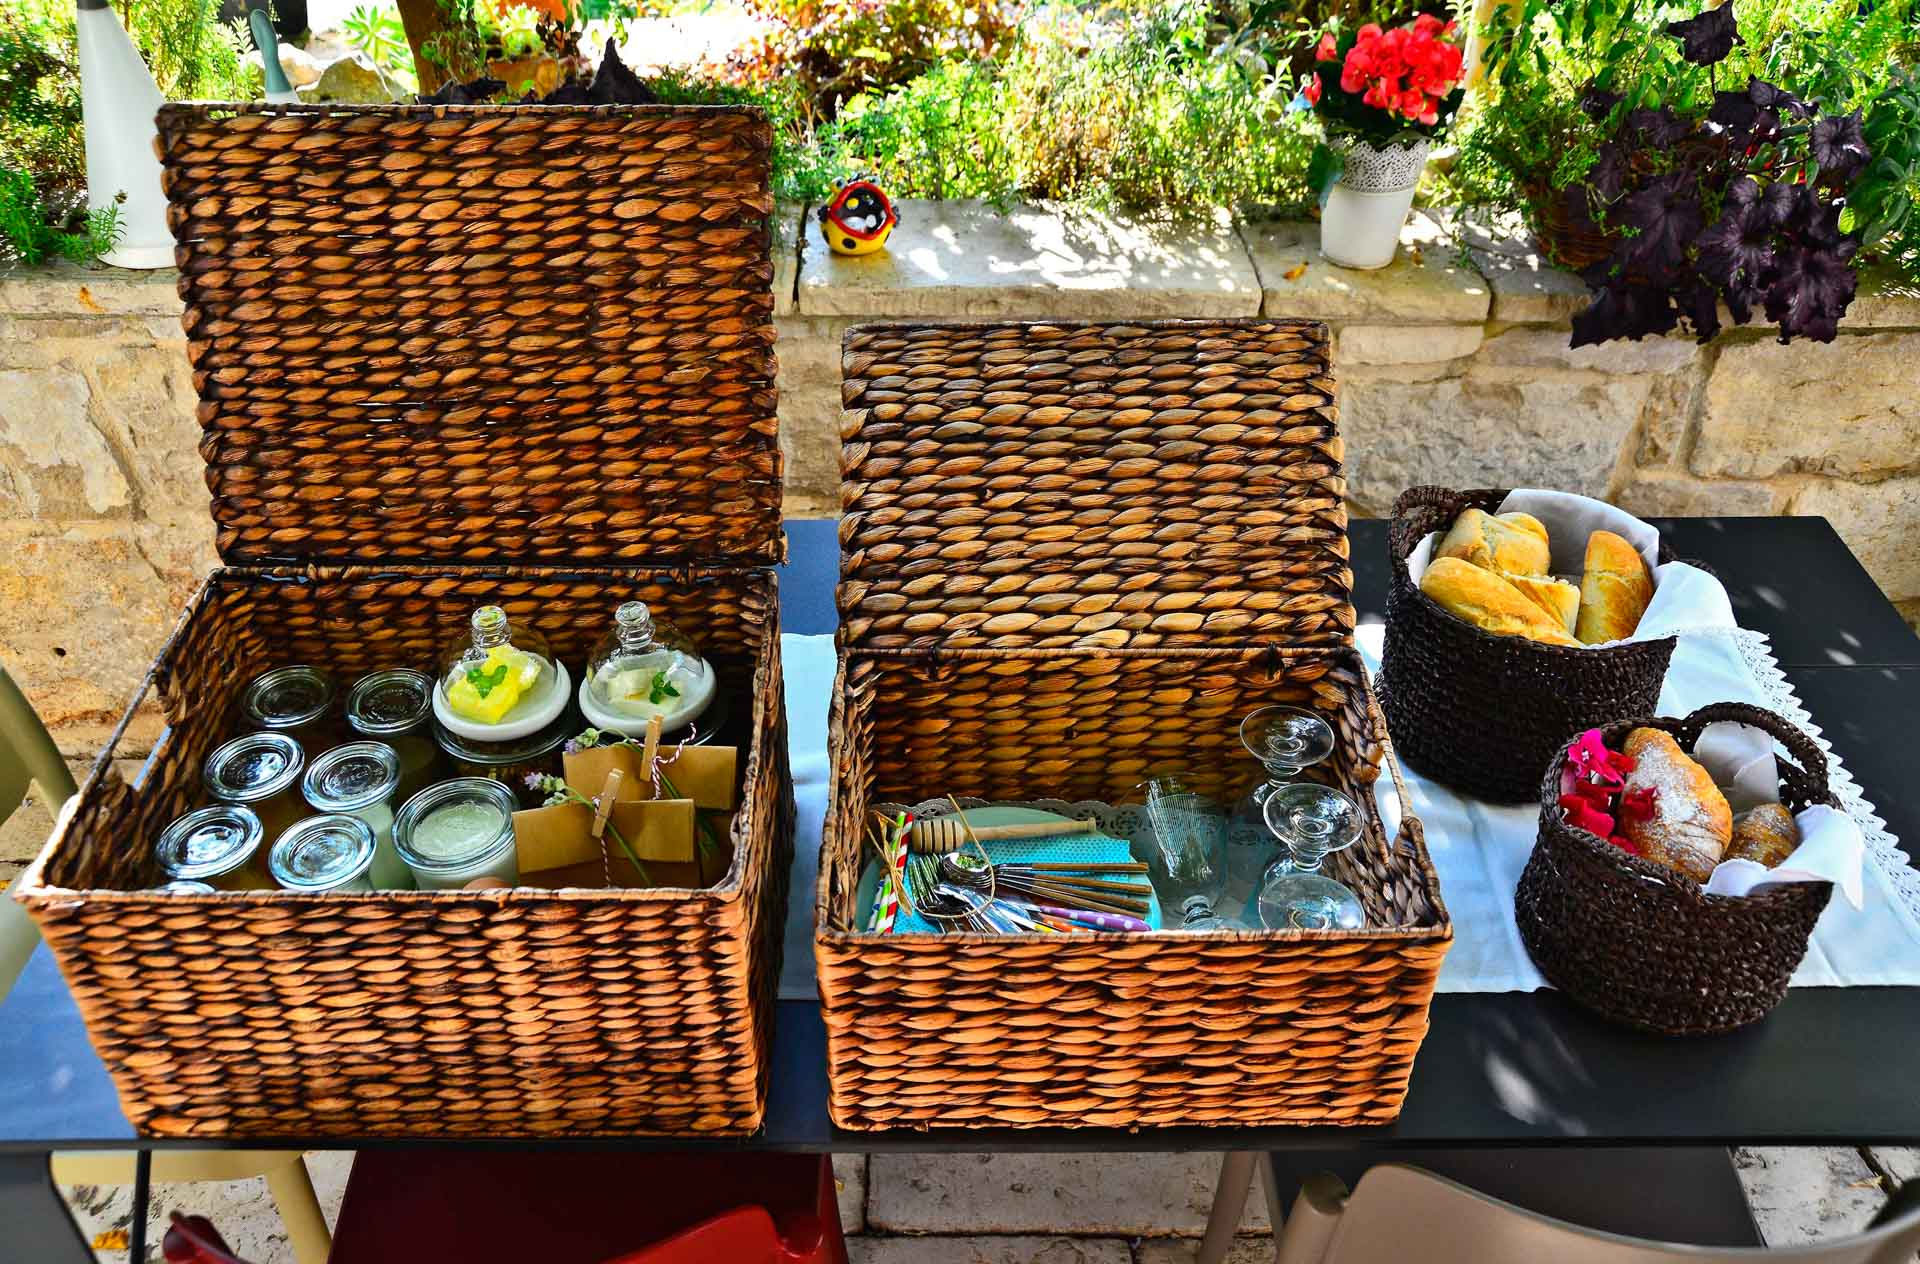 Vila za odmor sa bazenom, stol s ukrasnim čašama